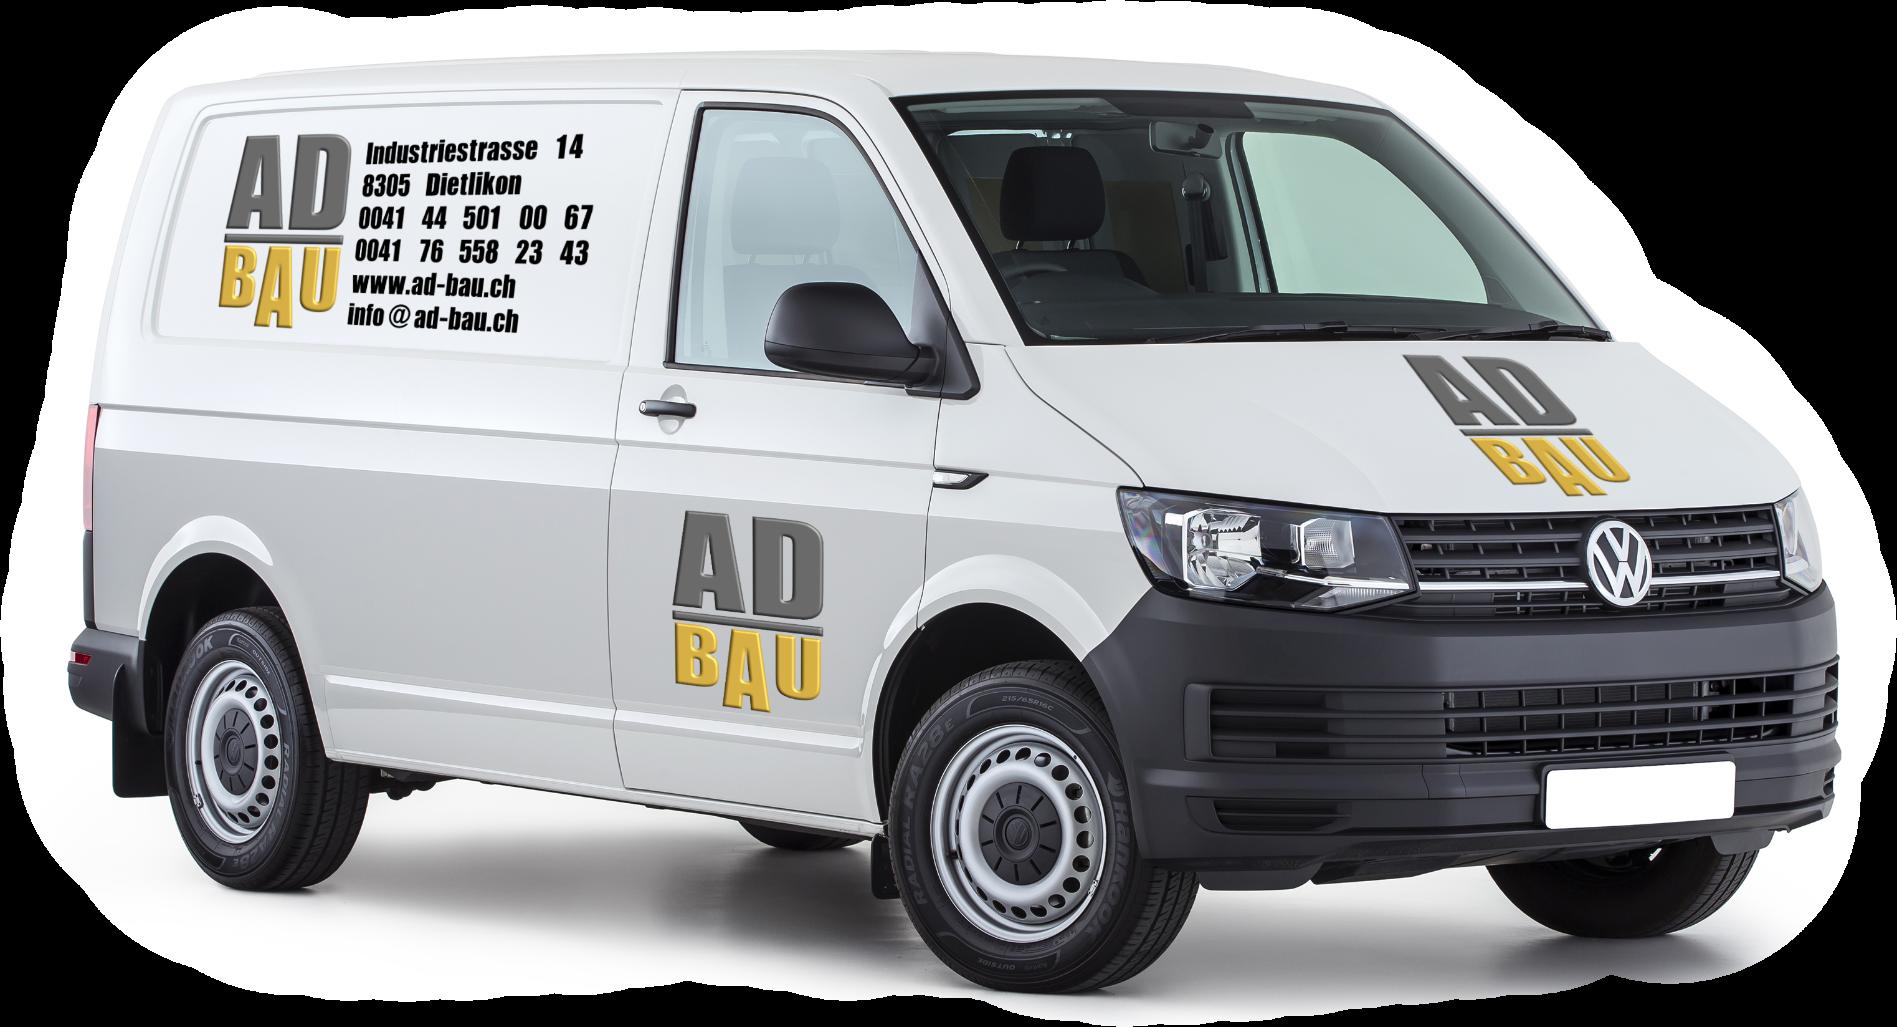 AD BAU Transporter M